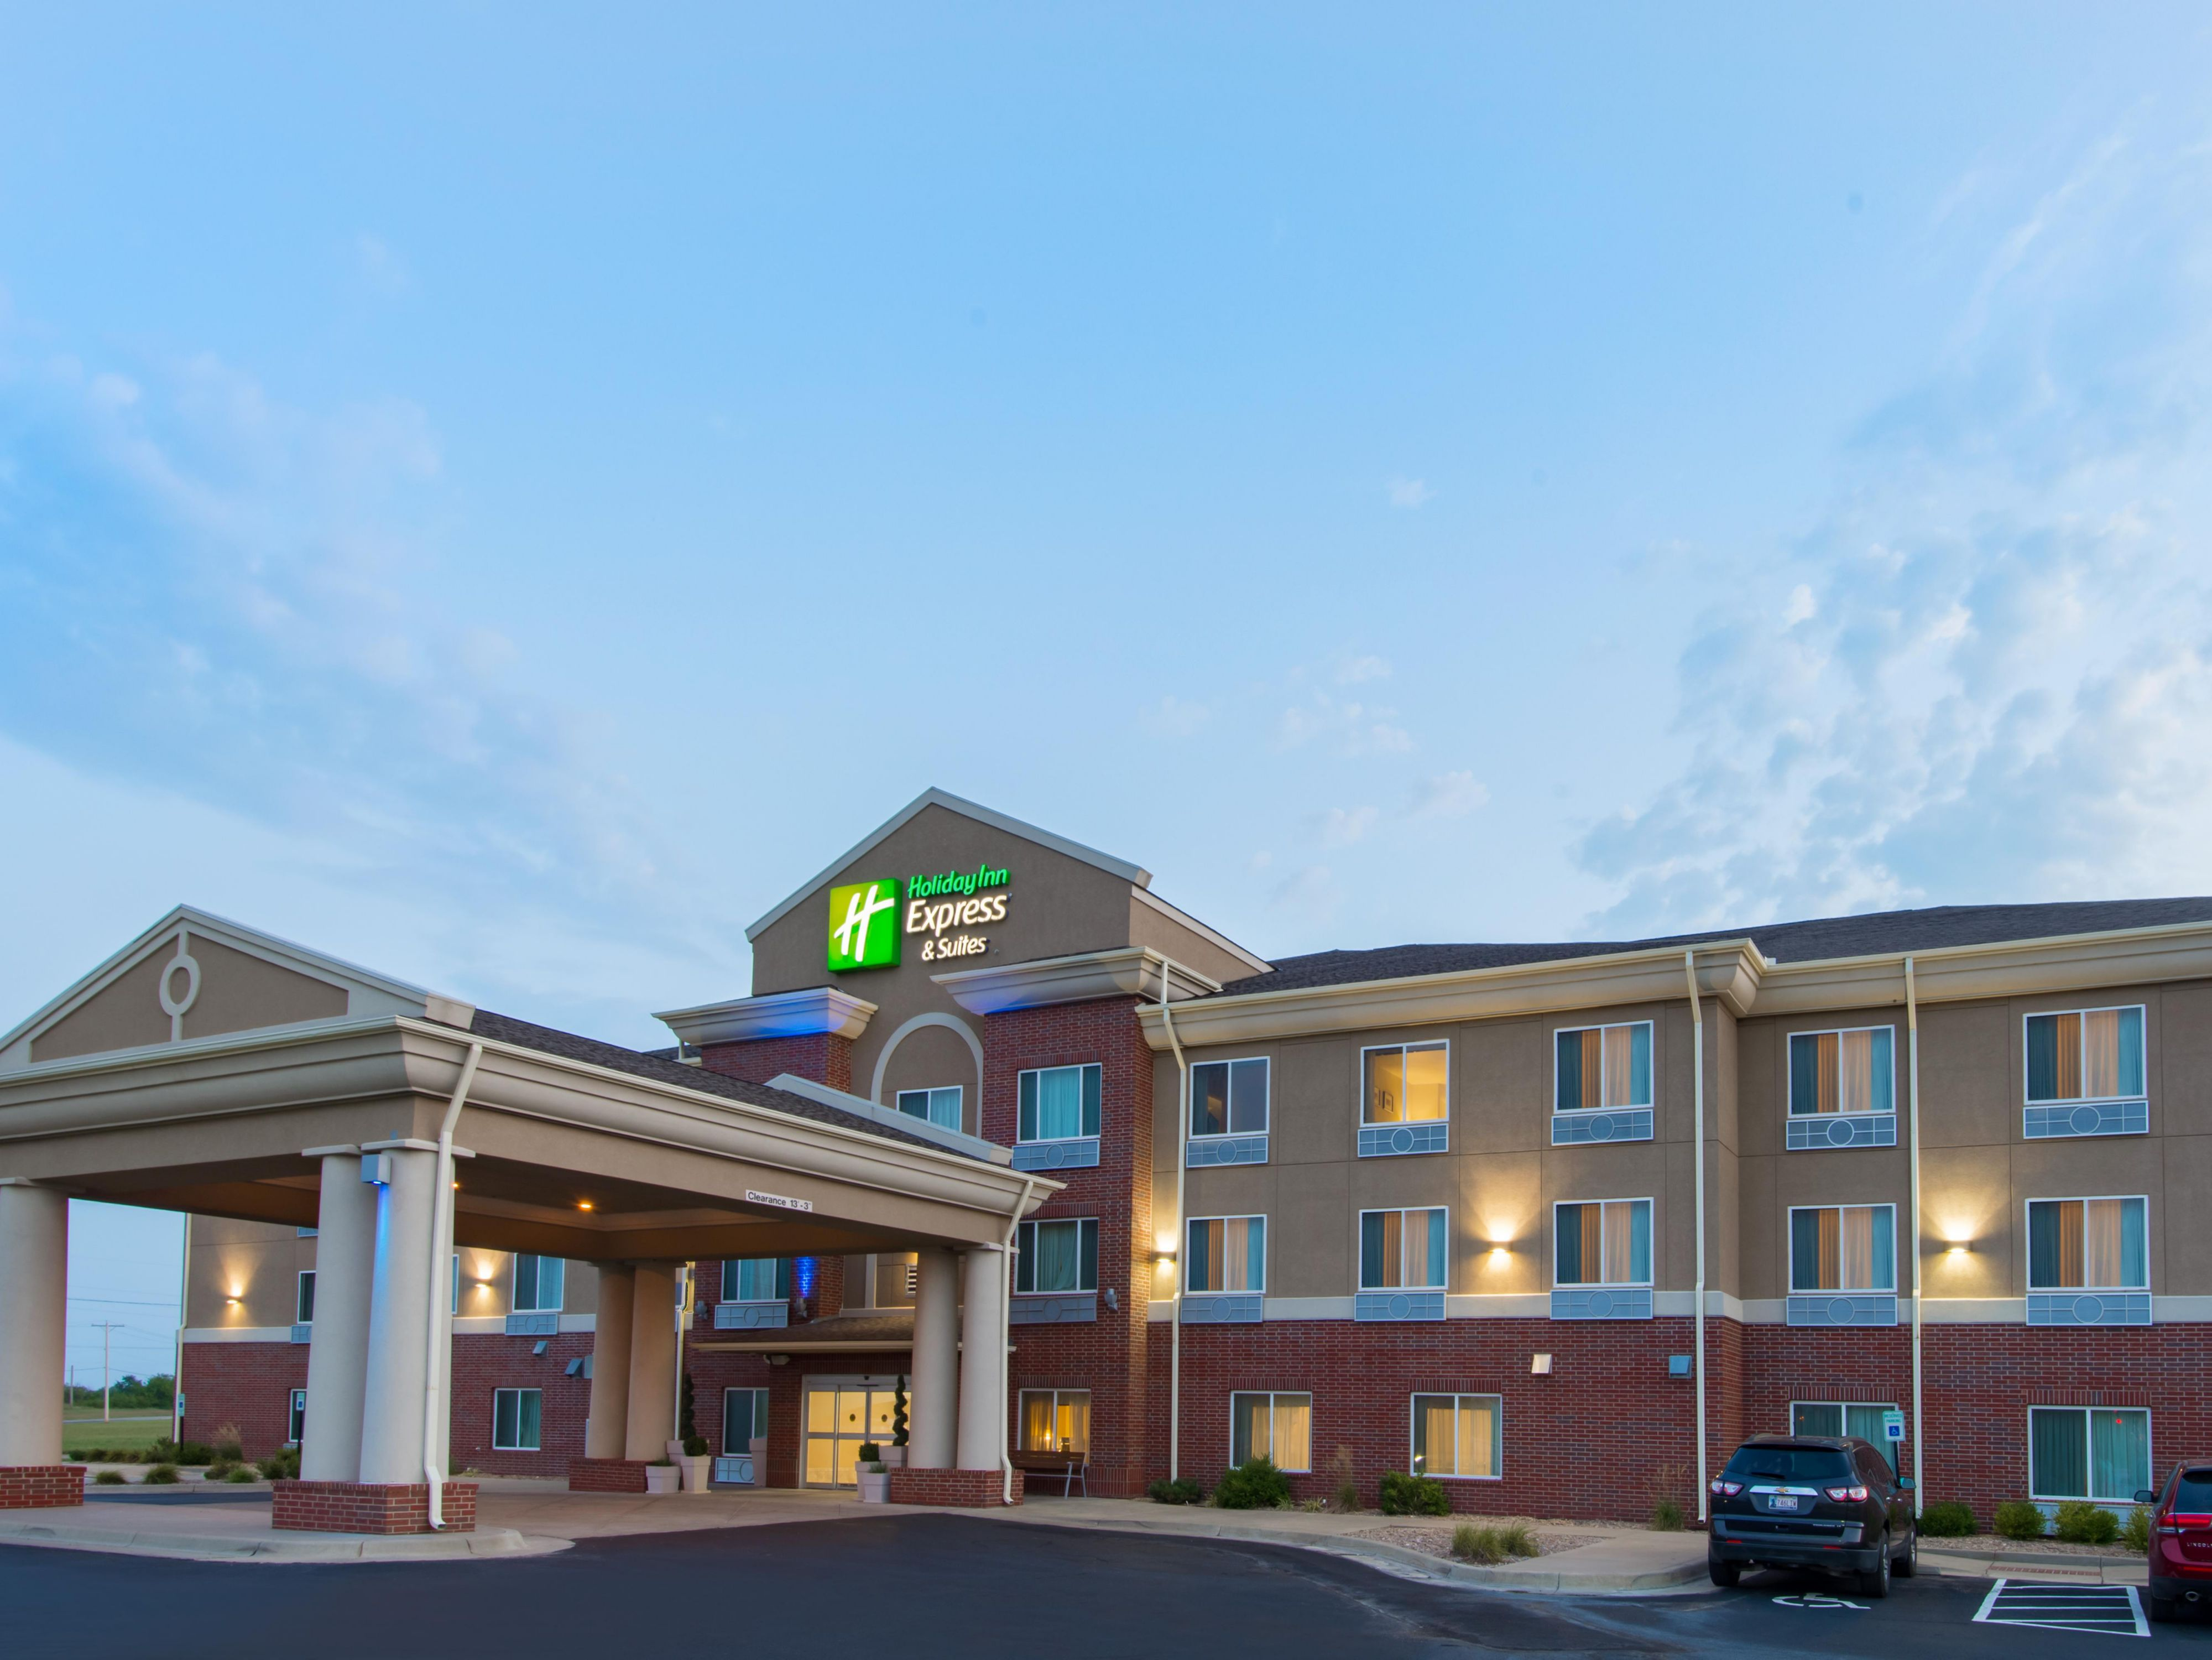 & Holiday Inn Express \u0026 Suites El Dorado KS Hotel by IHG